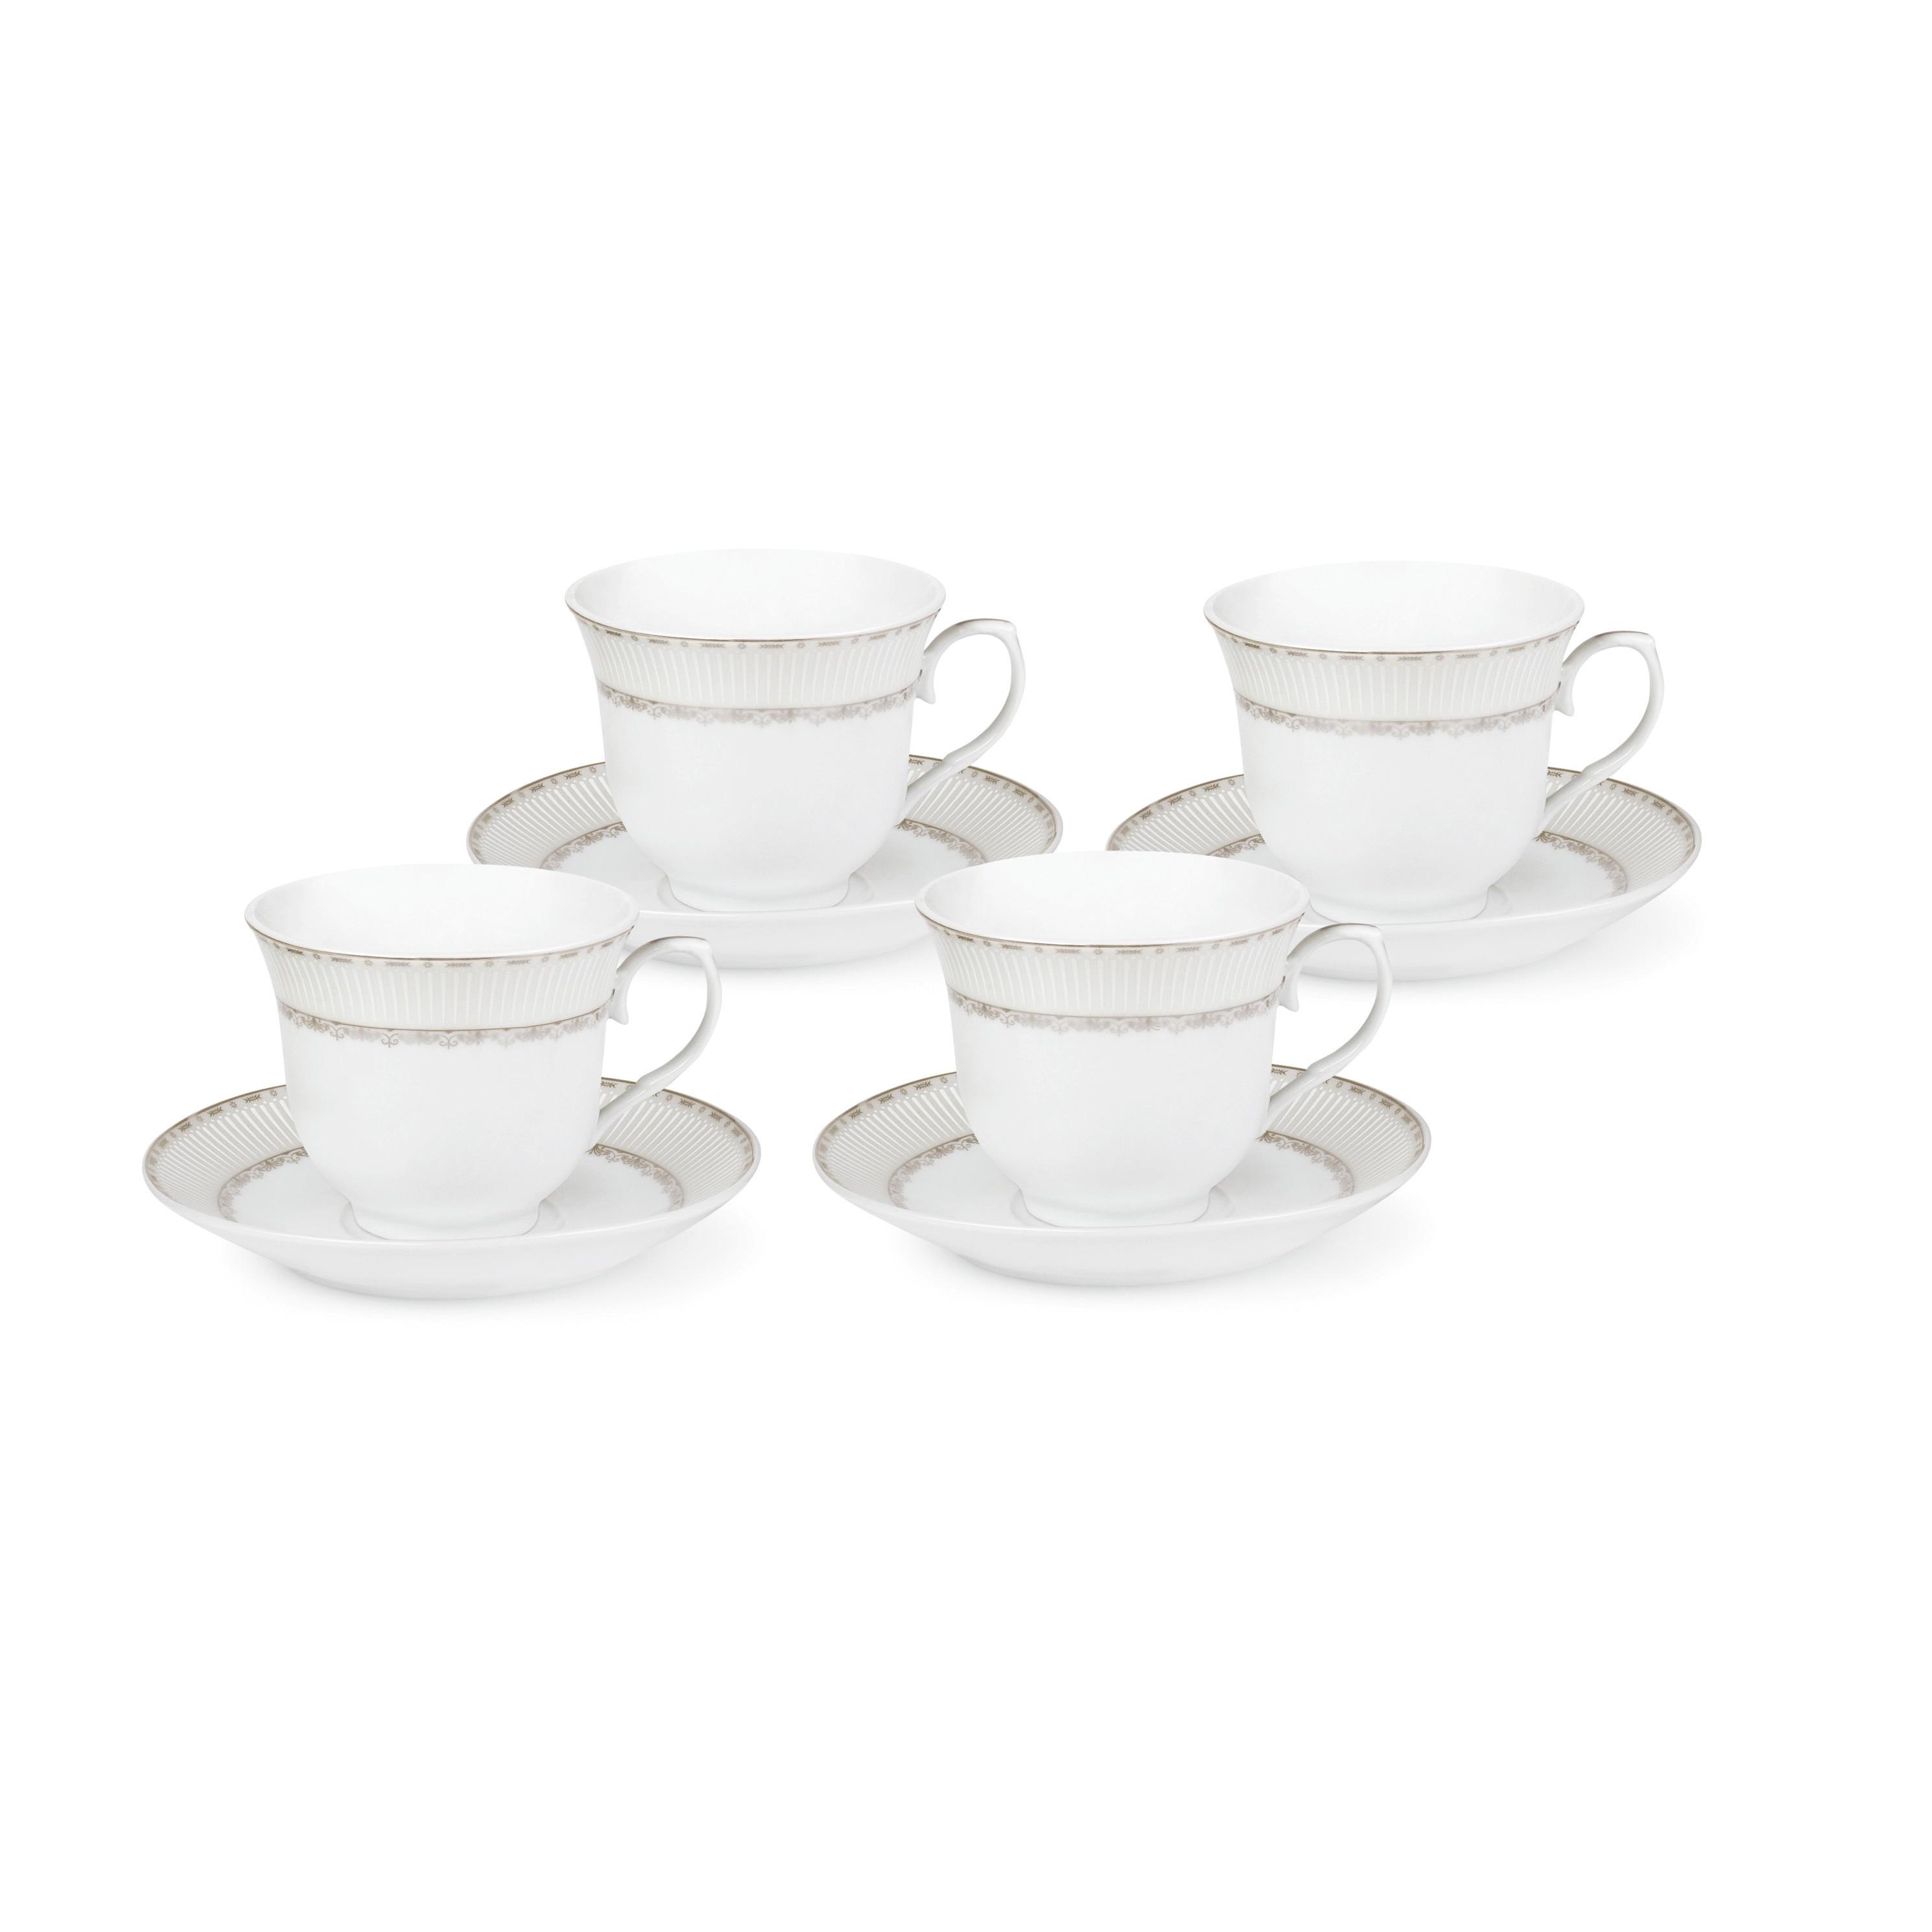 Lorren Home Trends Silver-design Service for 4 Tea/Coffee...